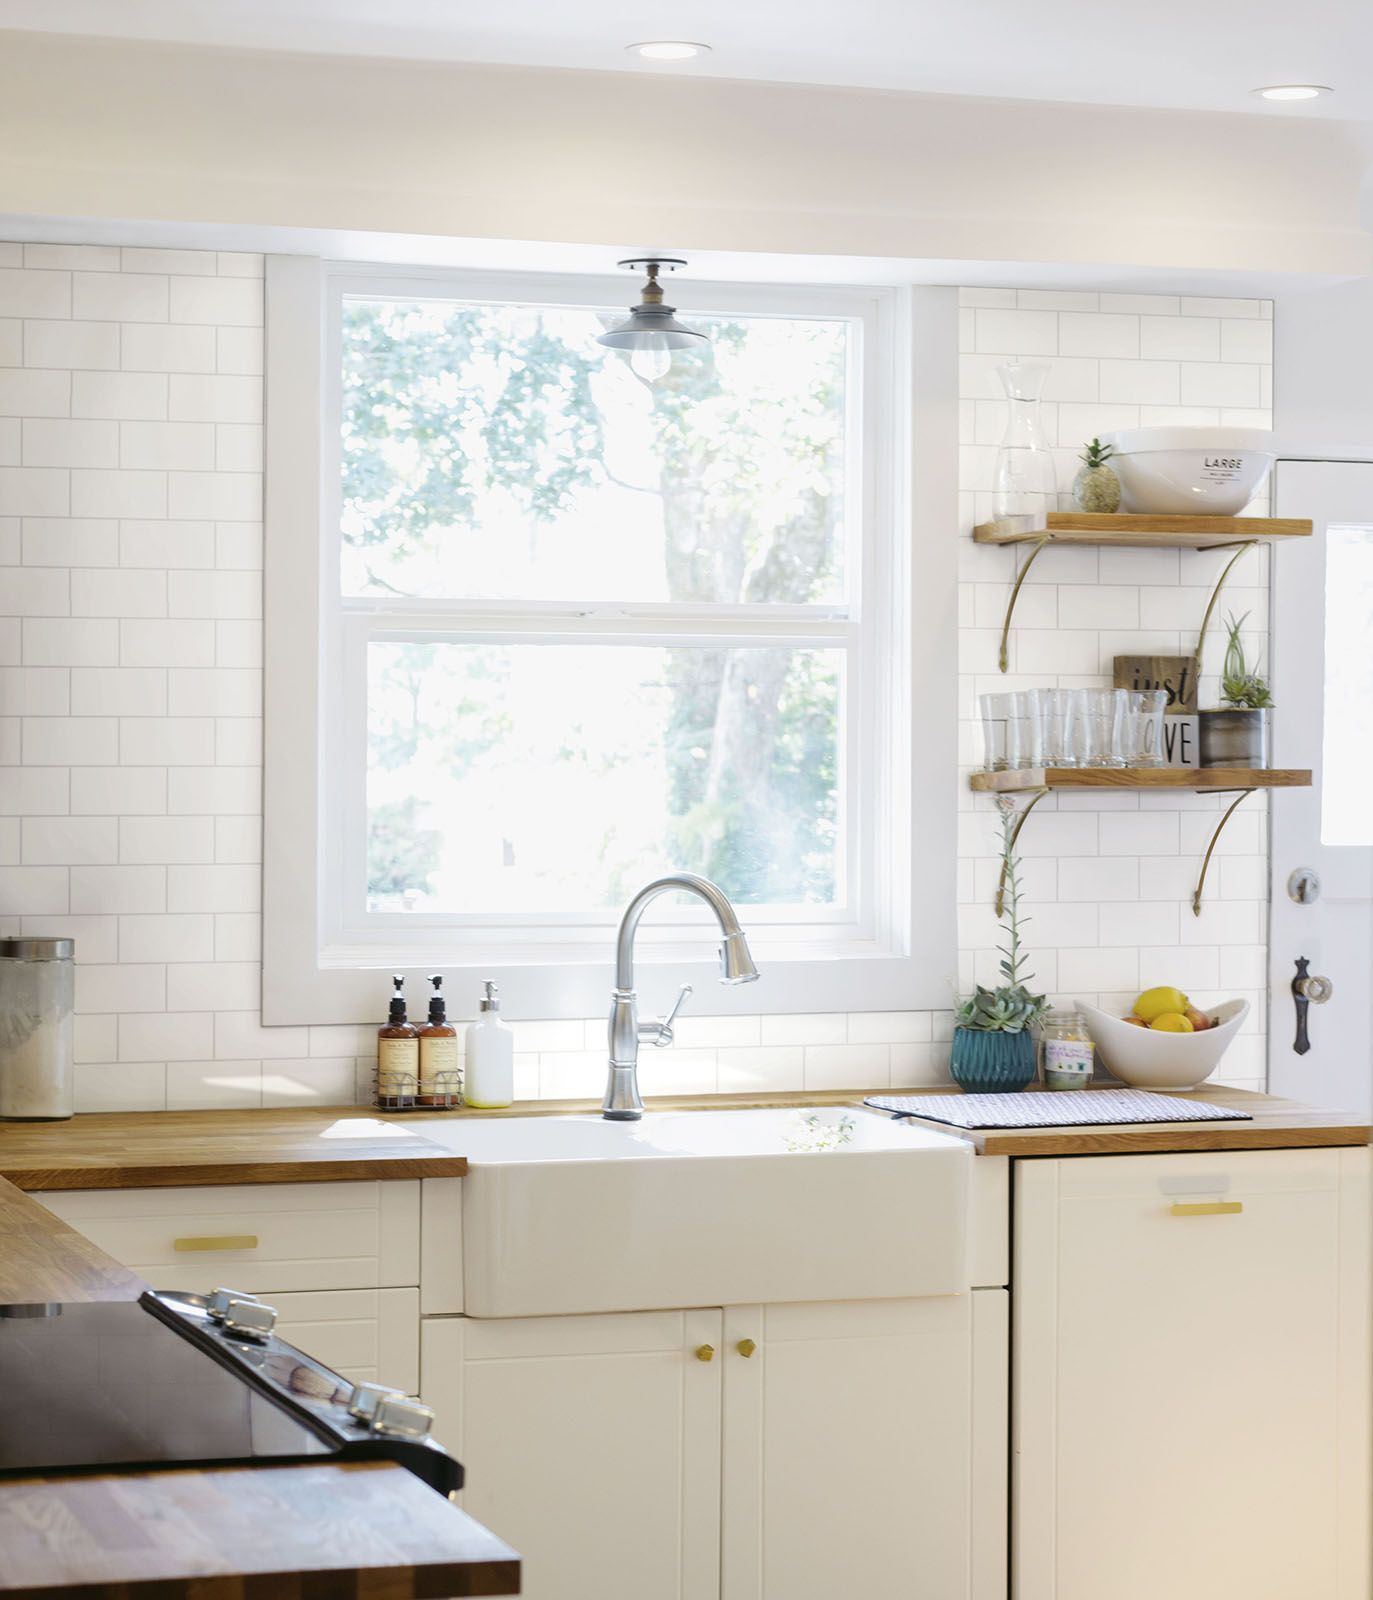 Elegant Hello Ceramic Tiles #Marazzi #tiles #walltiles #brickeffect #kitchen  #kitchendesign #ceramics